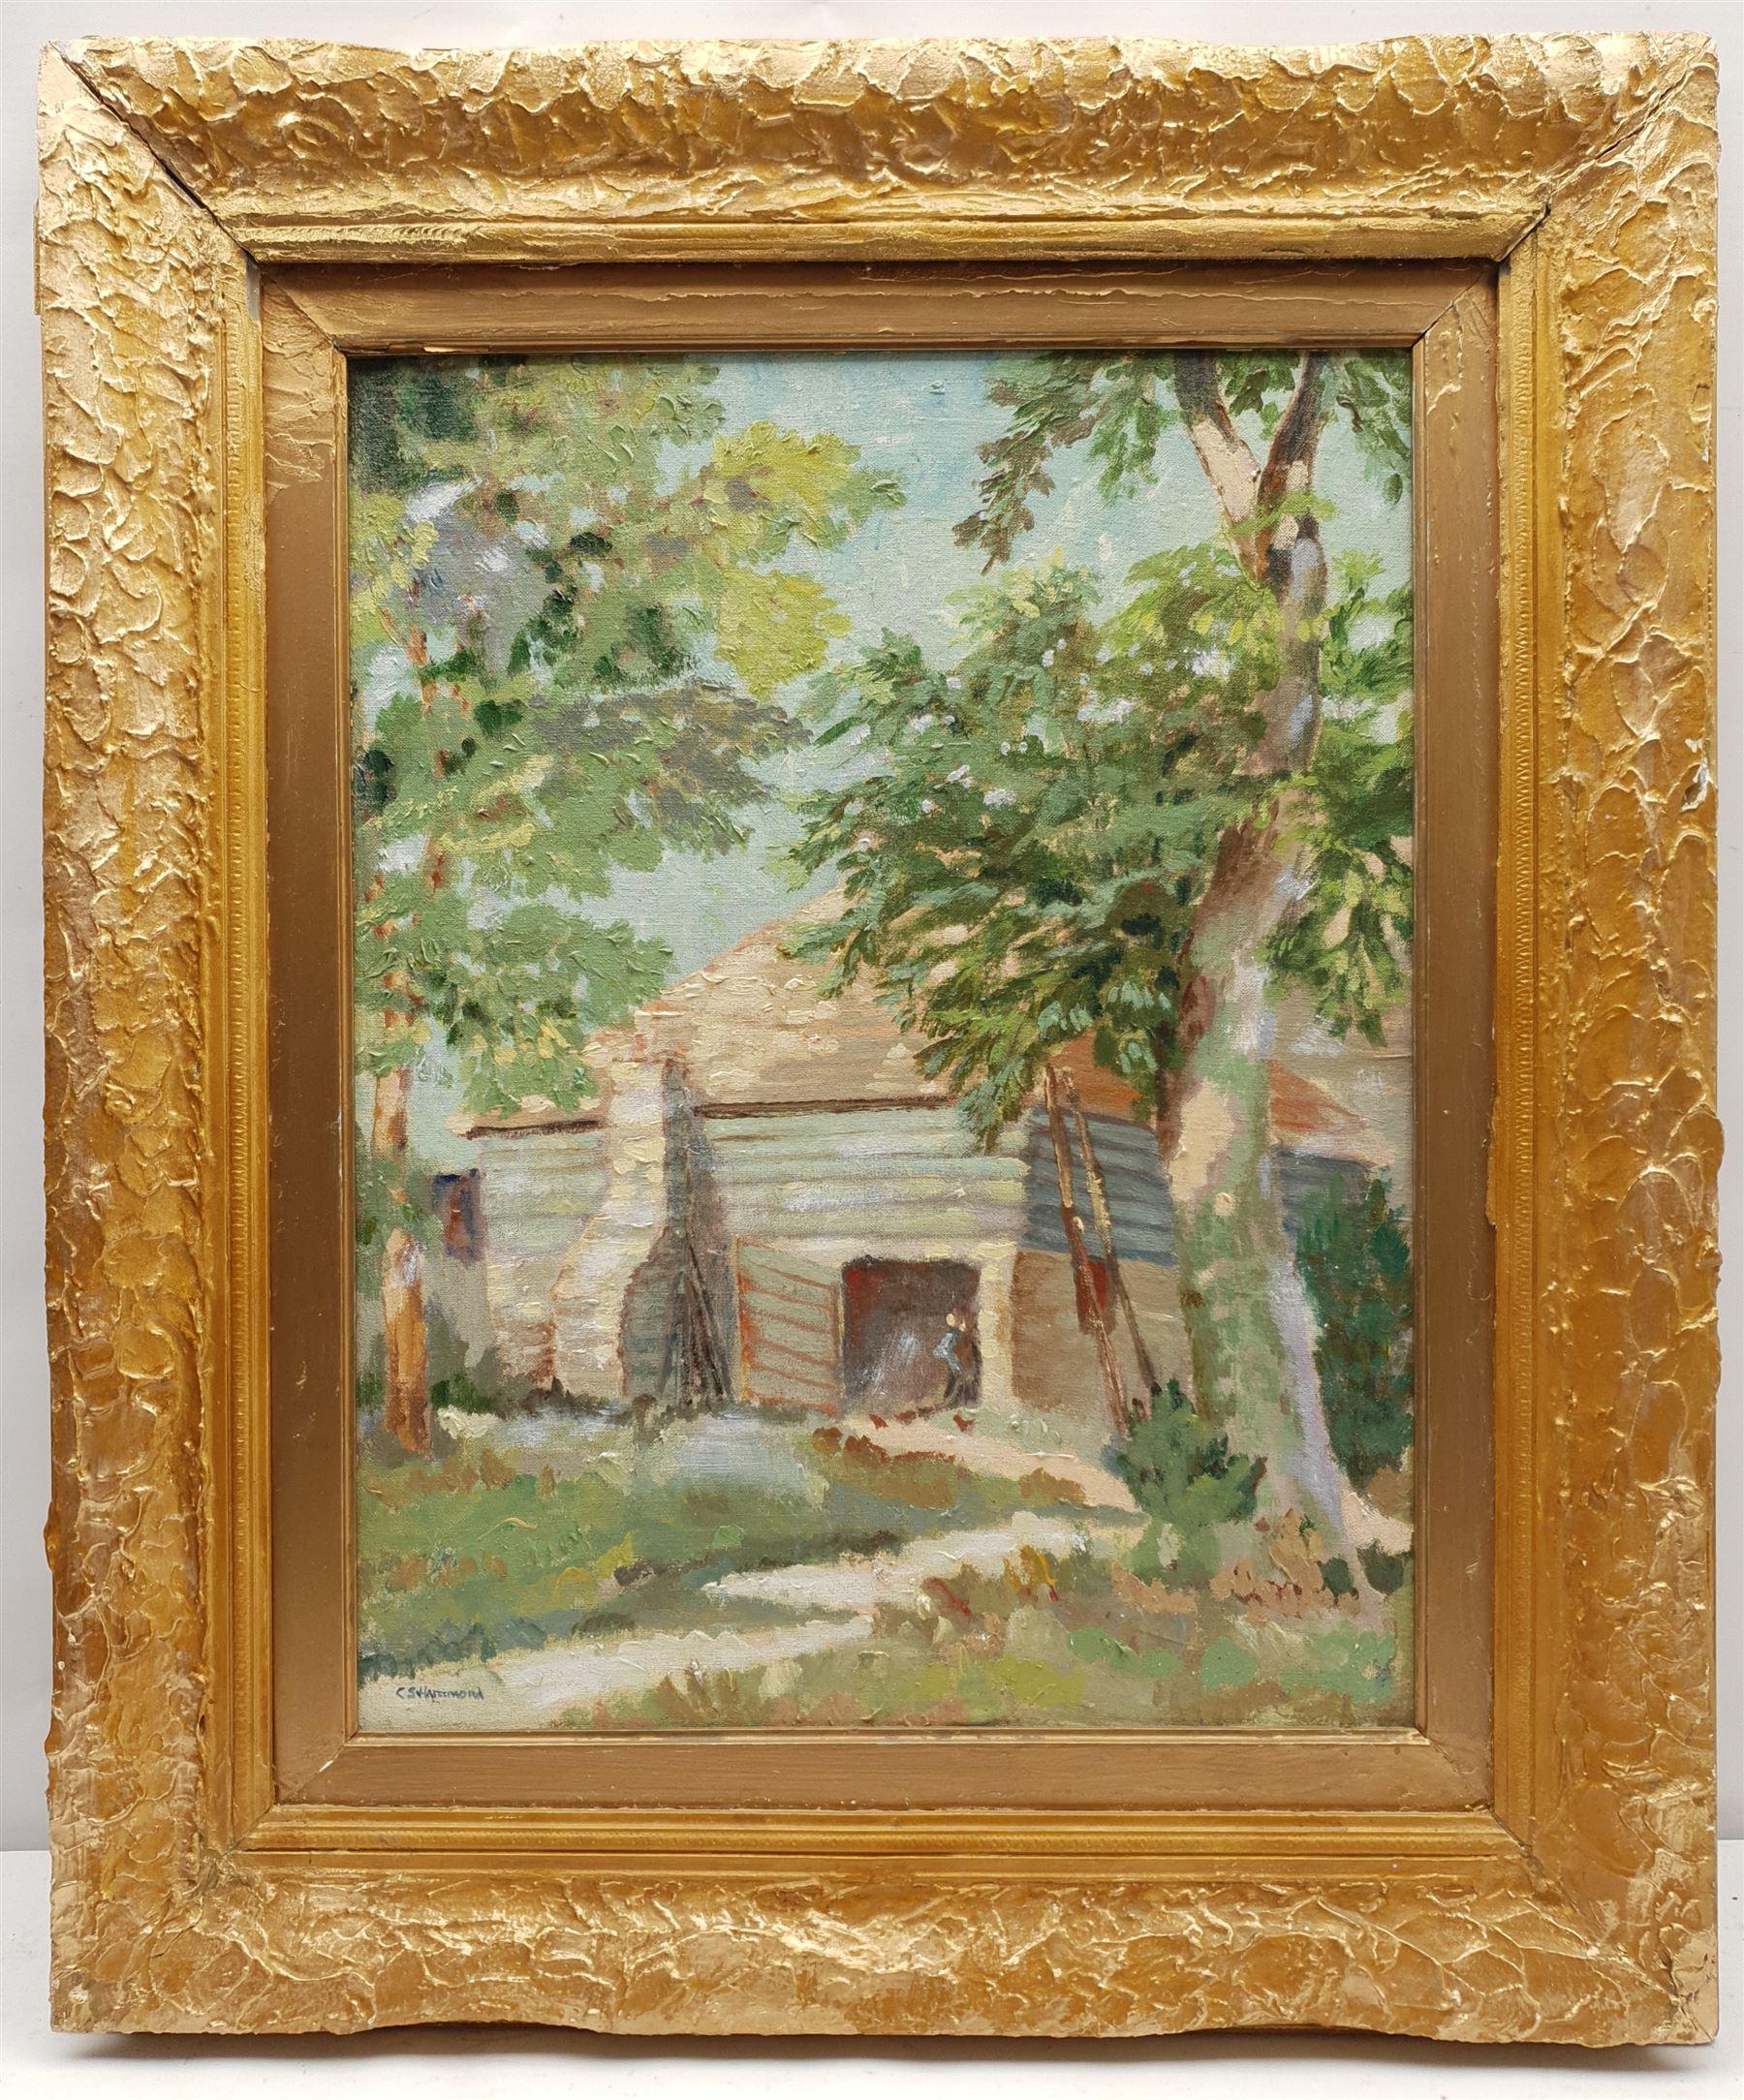 C S Hammond (Early 20th century): Sunny Farmstead - Image 2 of 4